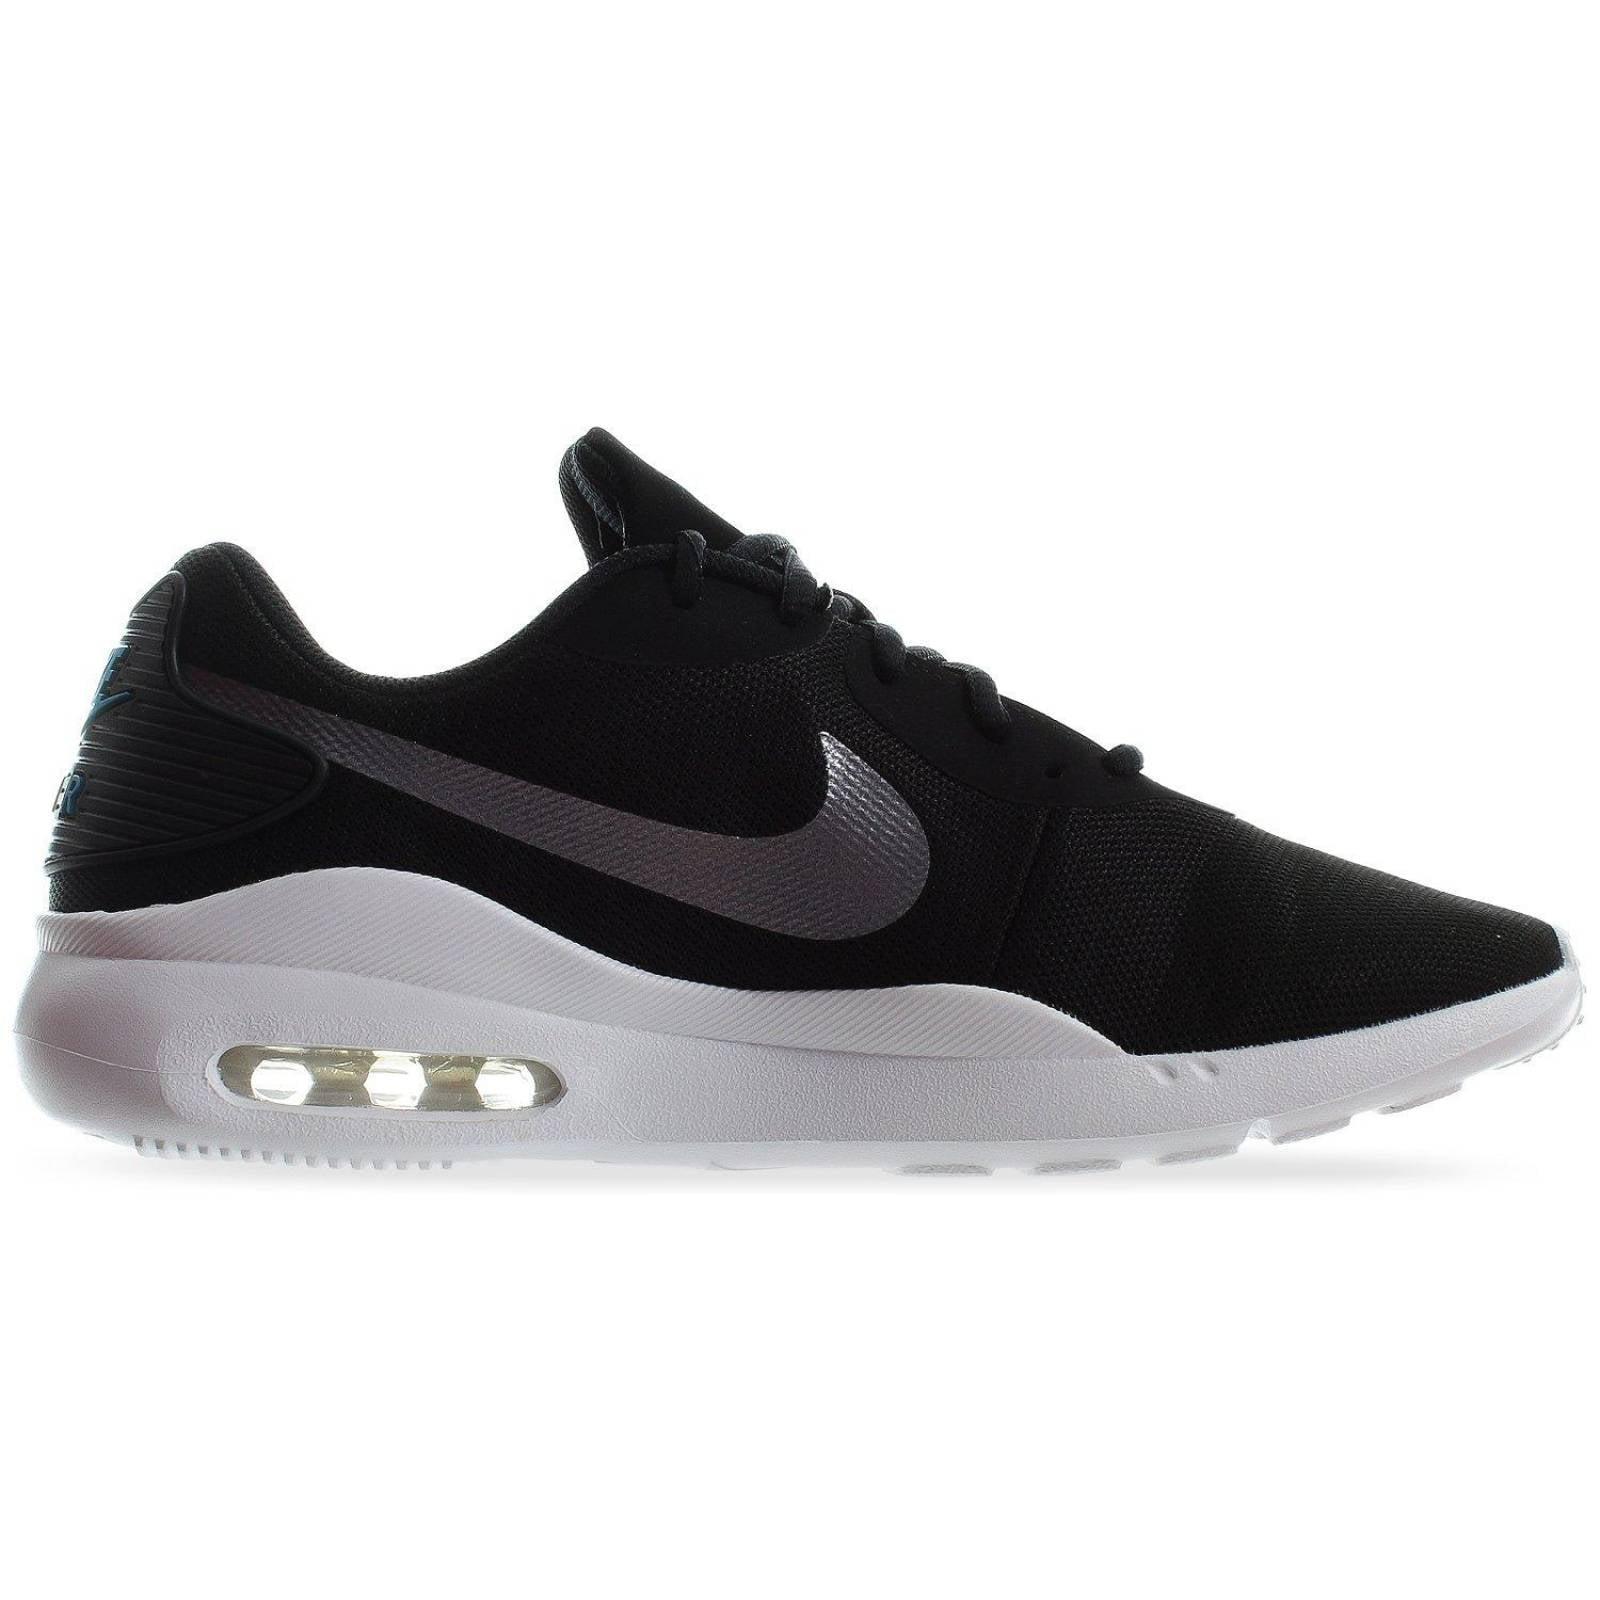 Tenis Nike Air Max Oketo - AQ2235015 - Negro - Hombre